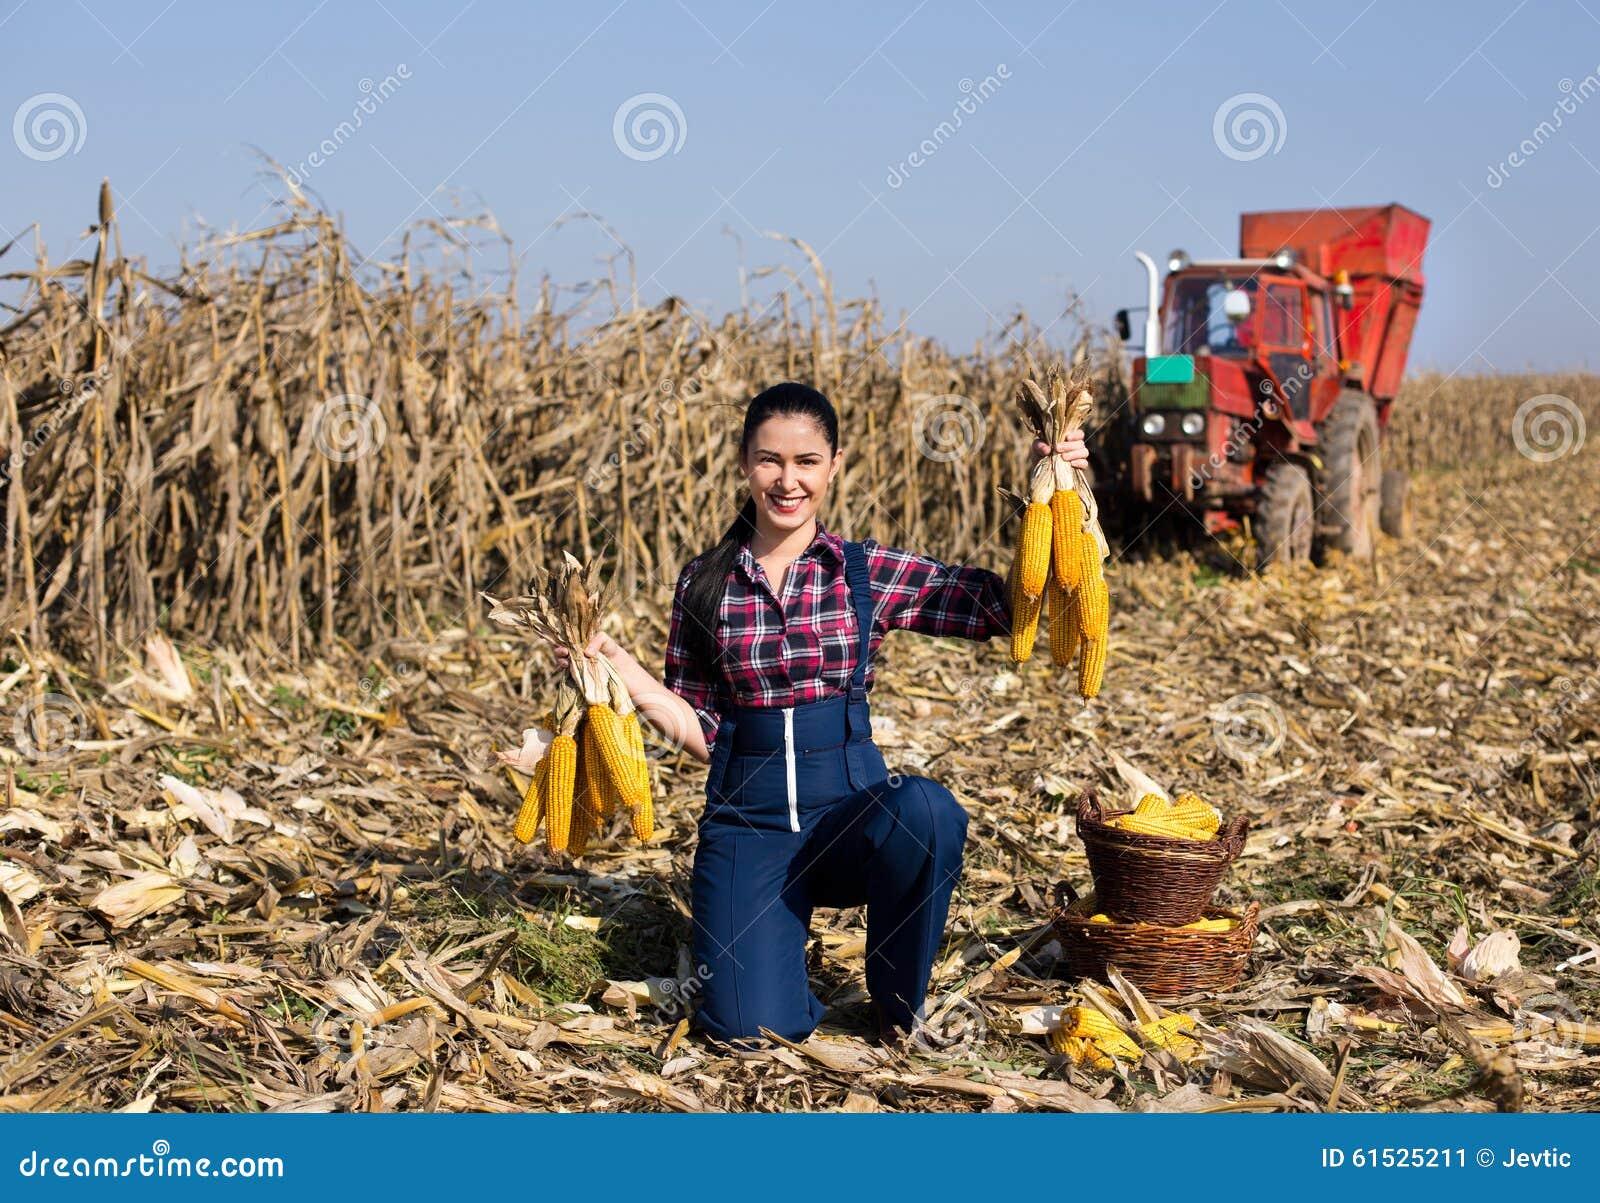 Woman In Corn Field Stock Photo - Image: 61525211